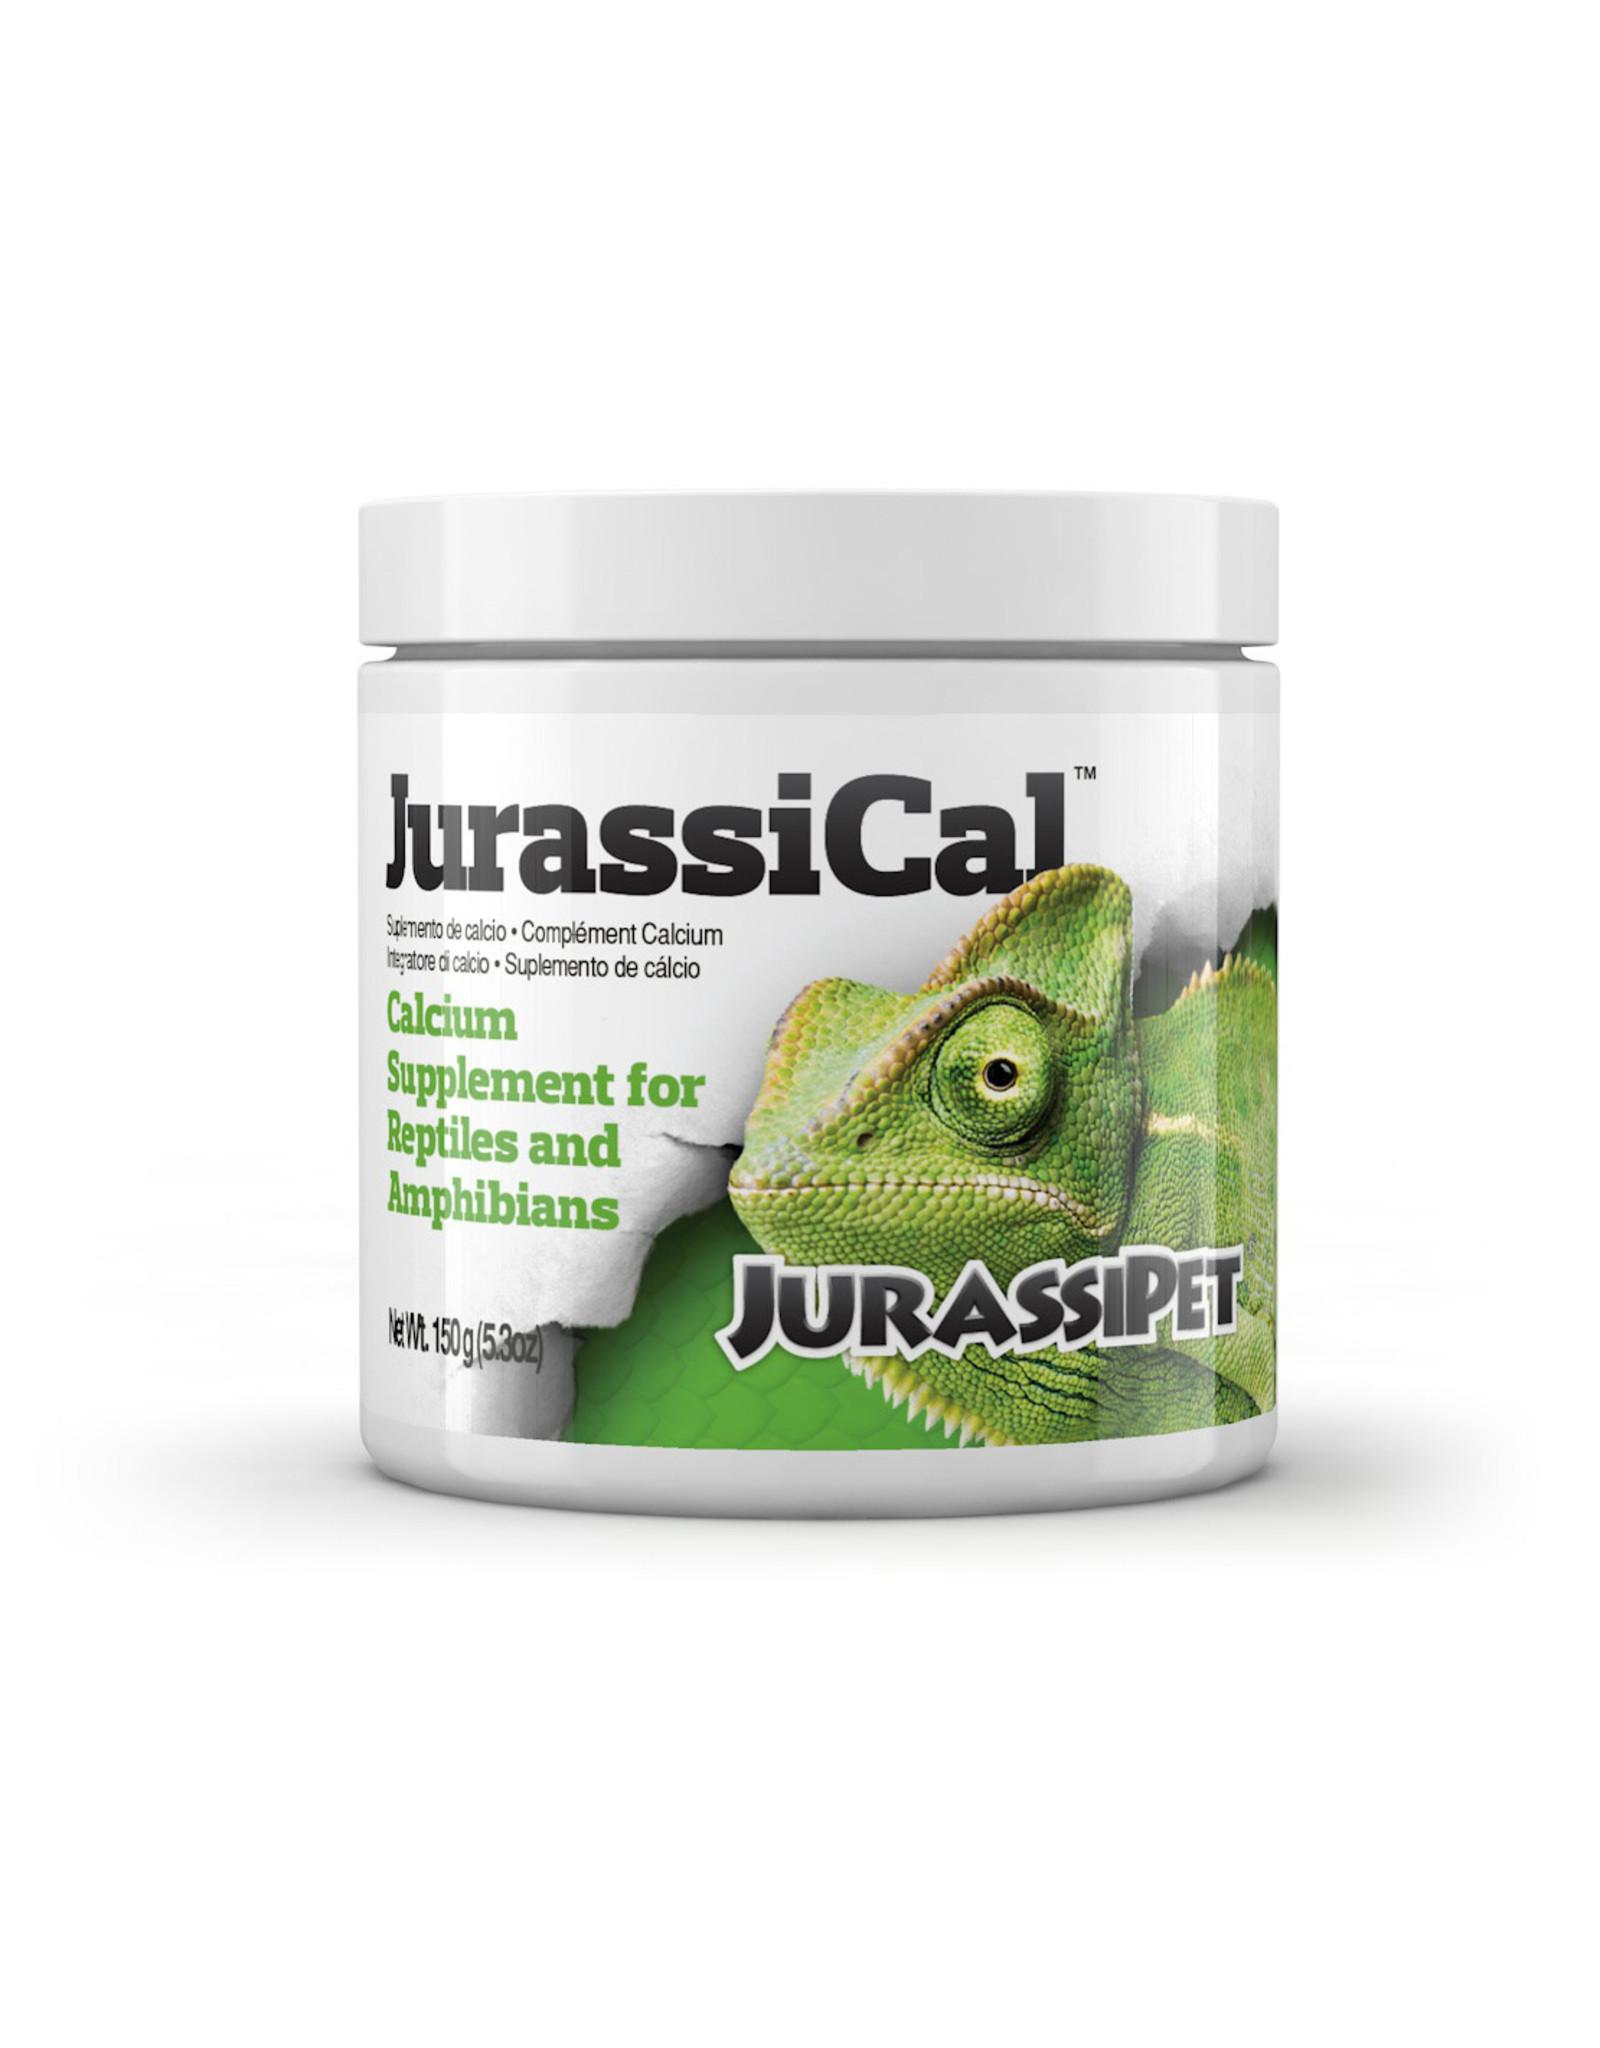 JurassiPet JURASSIPET JurassiCal Dry Calcium Supplement